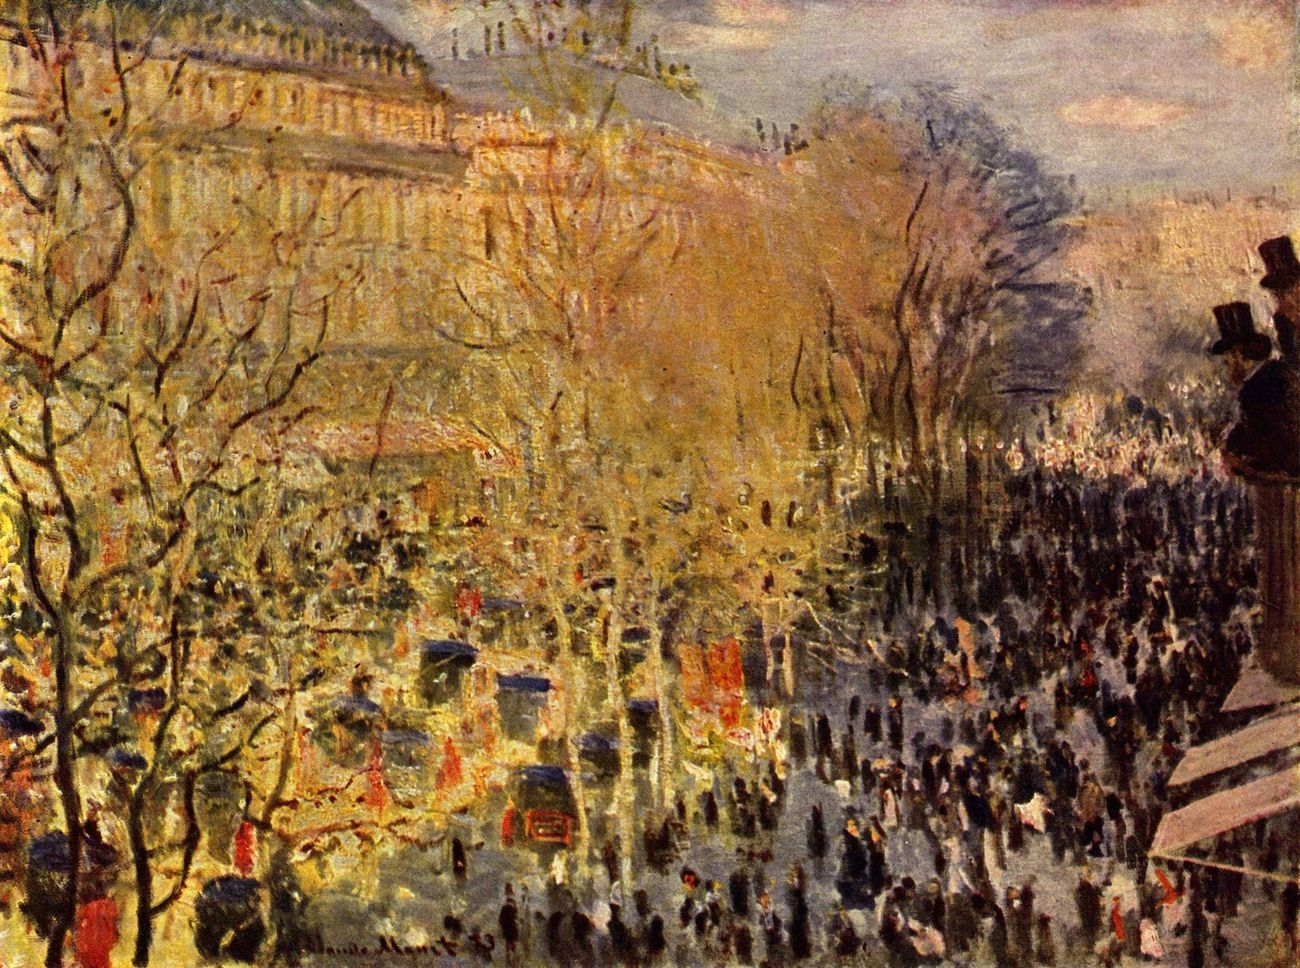 Claude Monet, Le Boulevard des Capucines, 1873, olio su tela, 60×80 cm. Museo Puškin, Mosca